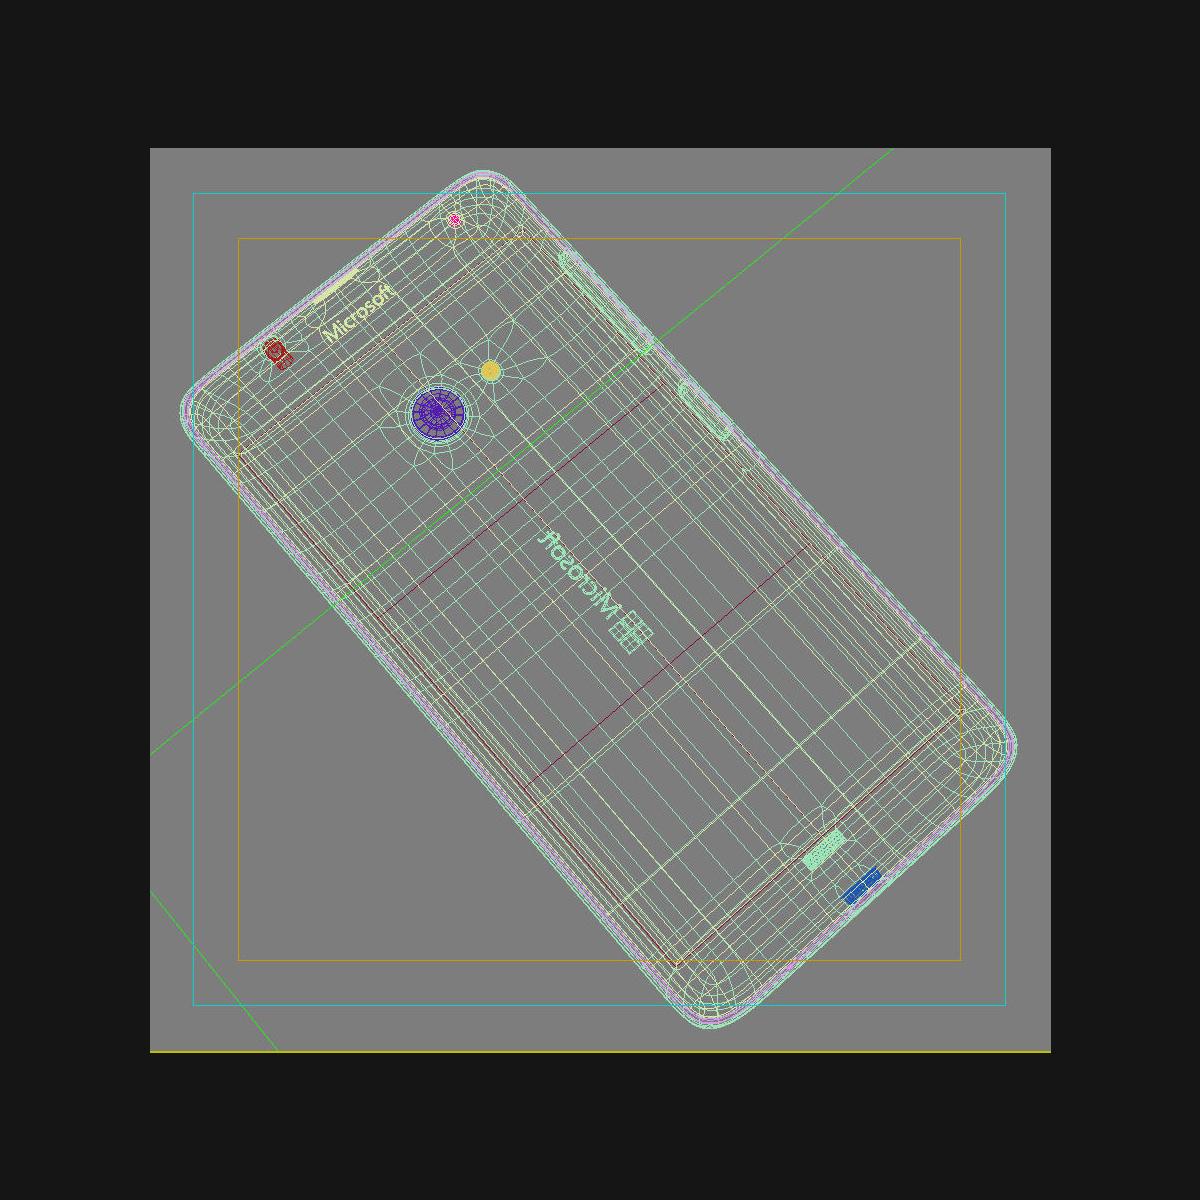 microsoft lumia 535 and dual sim green 3d model 3ds max fbx c4d obj 204202